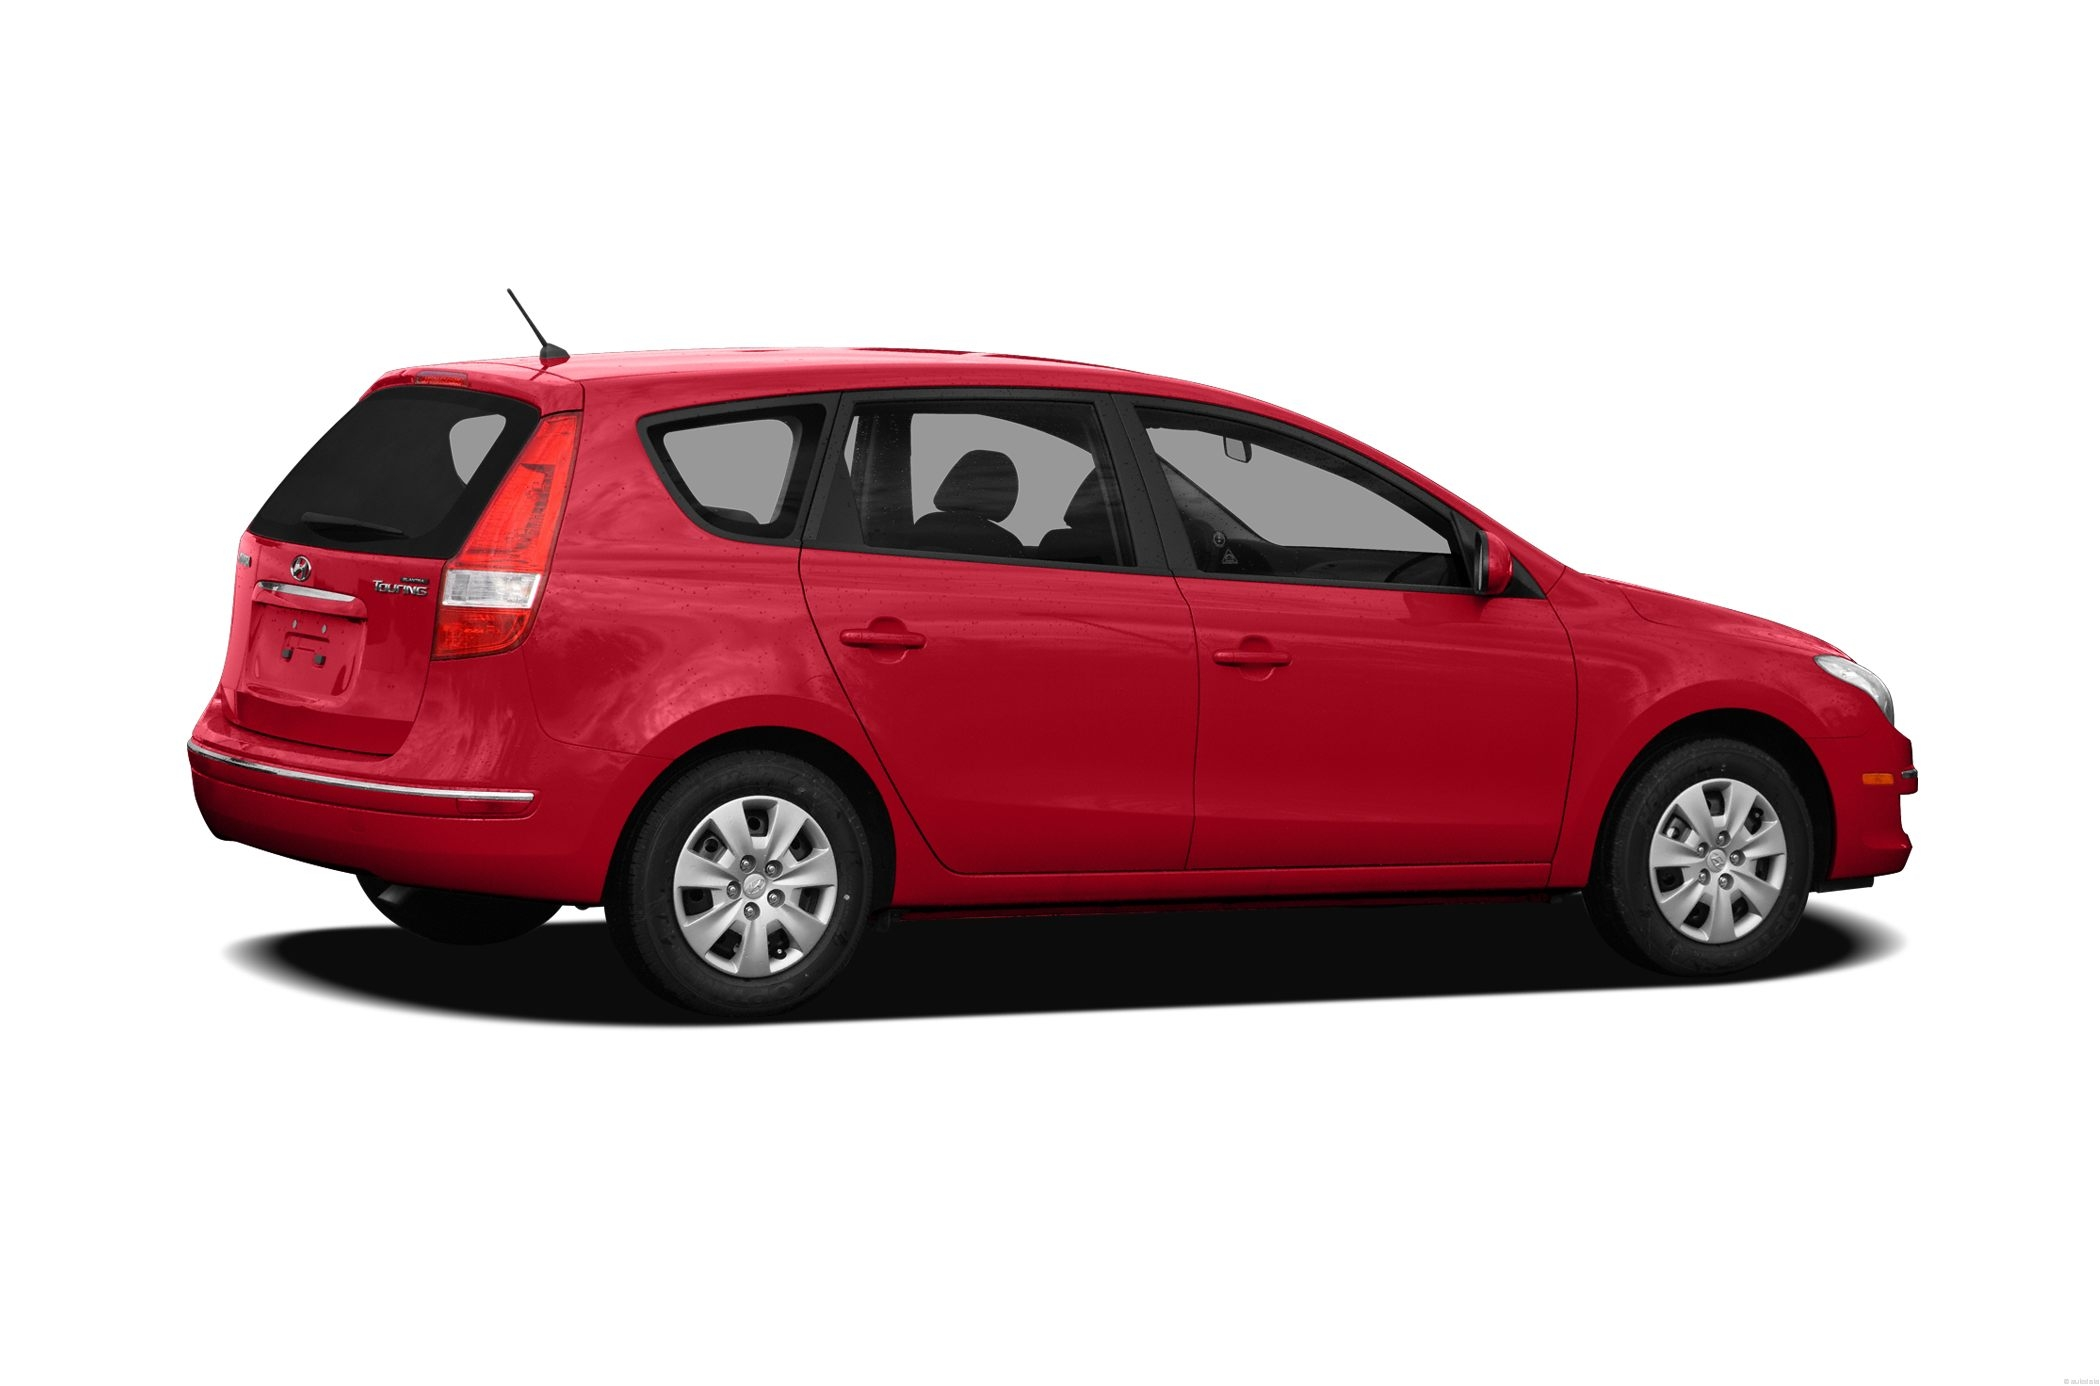 10 model elantra 2012 price hyundai elantra invoice price